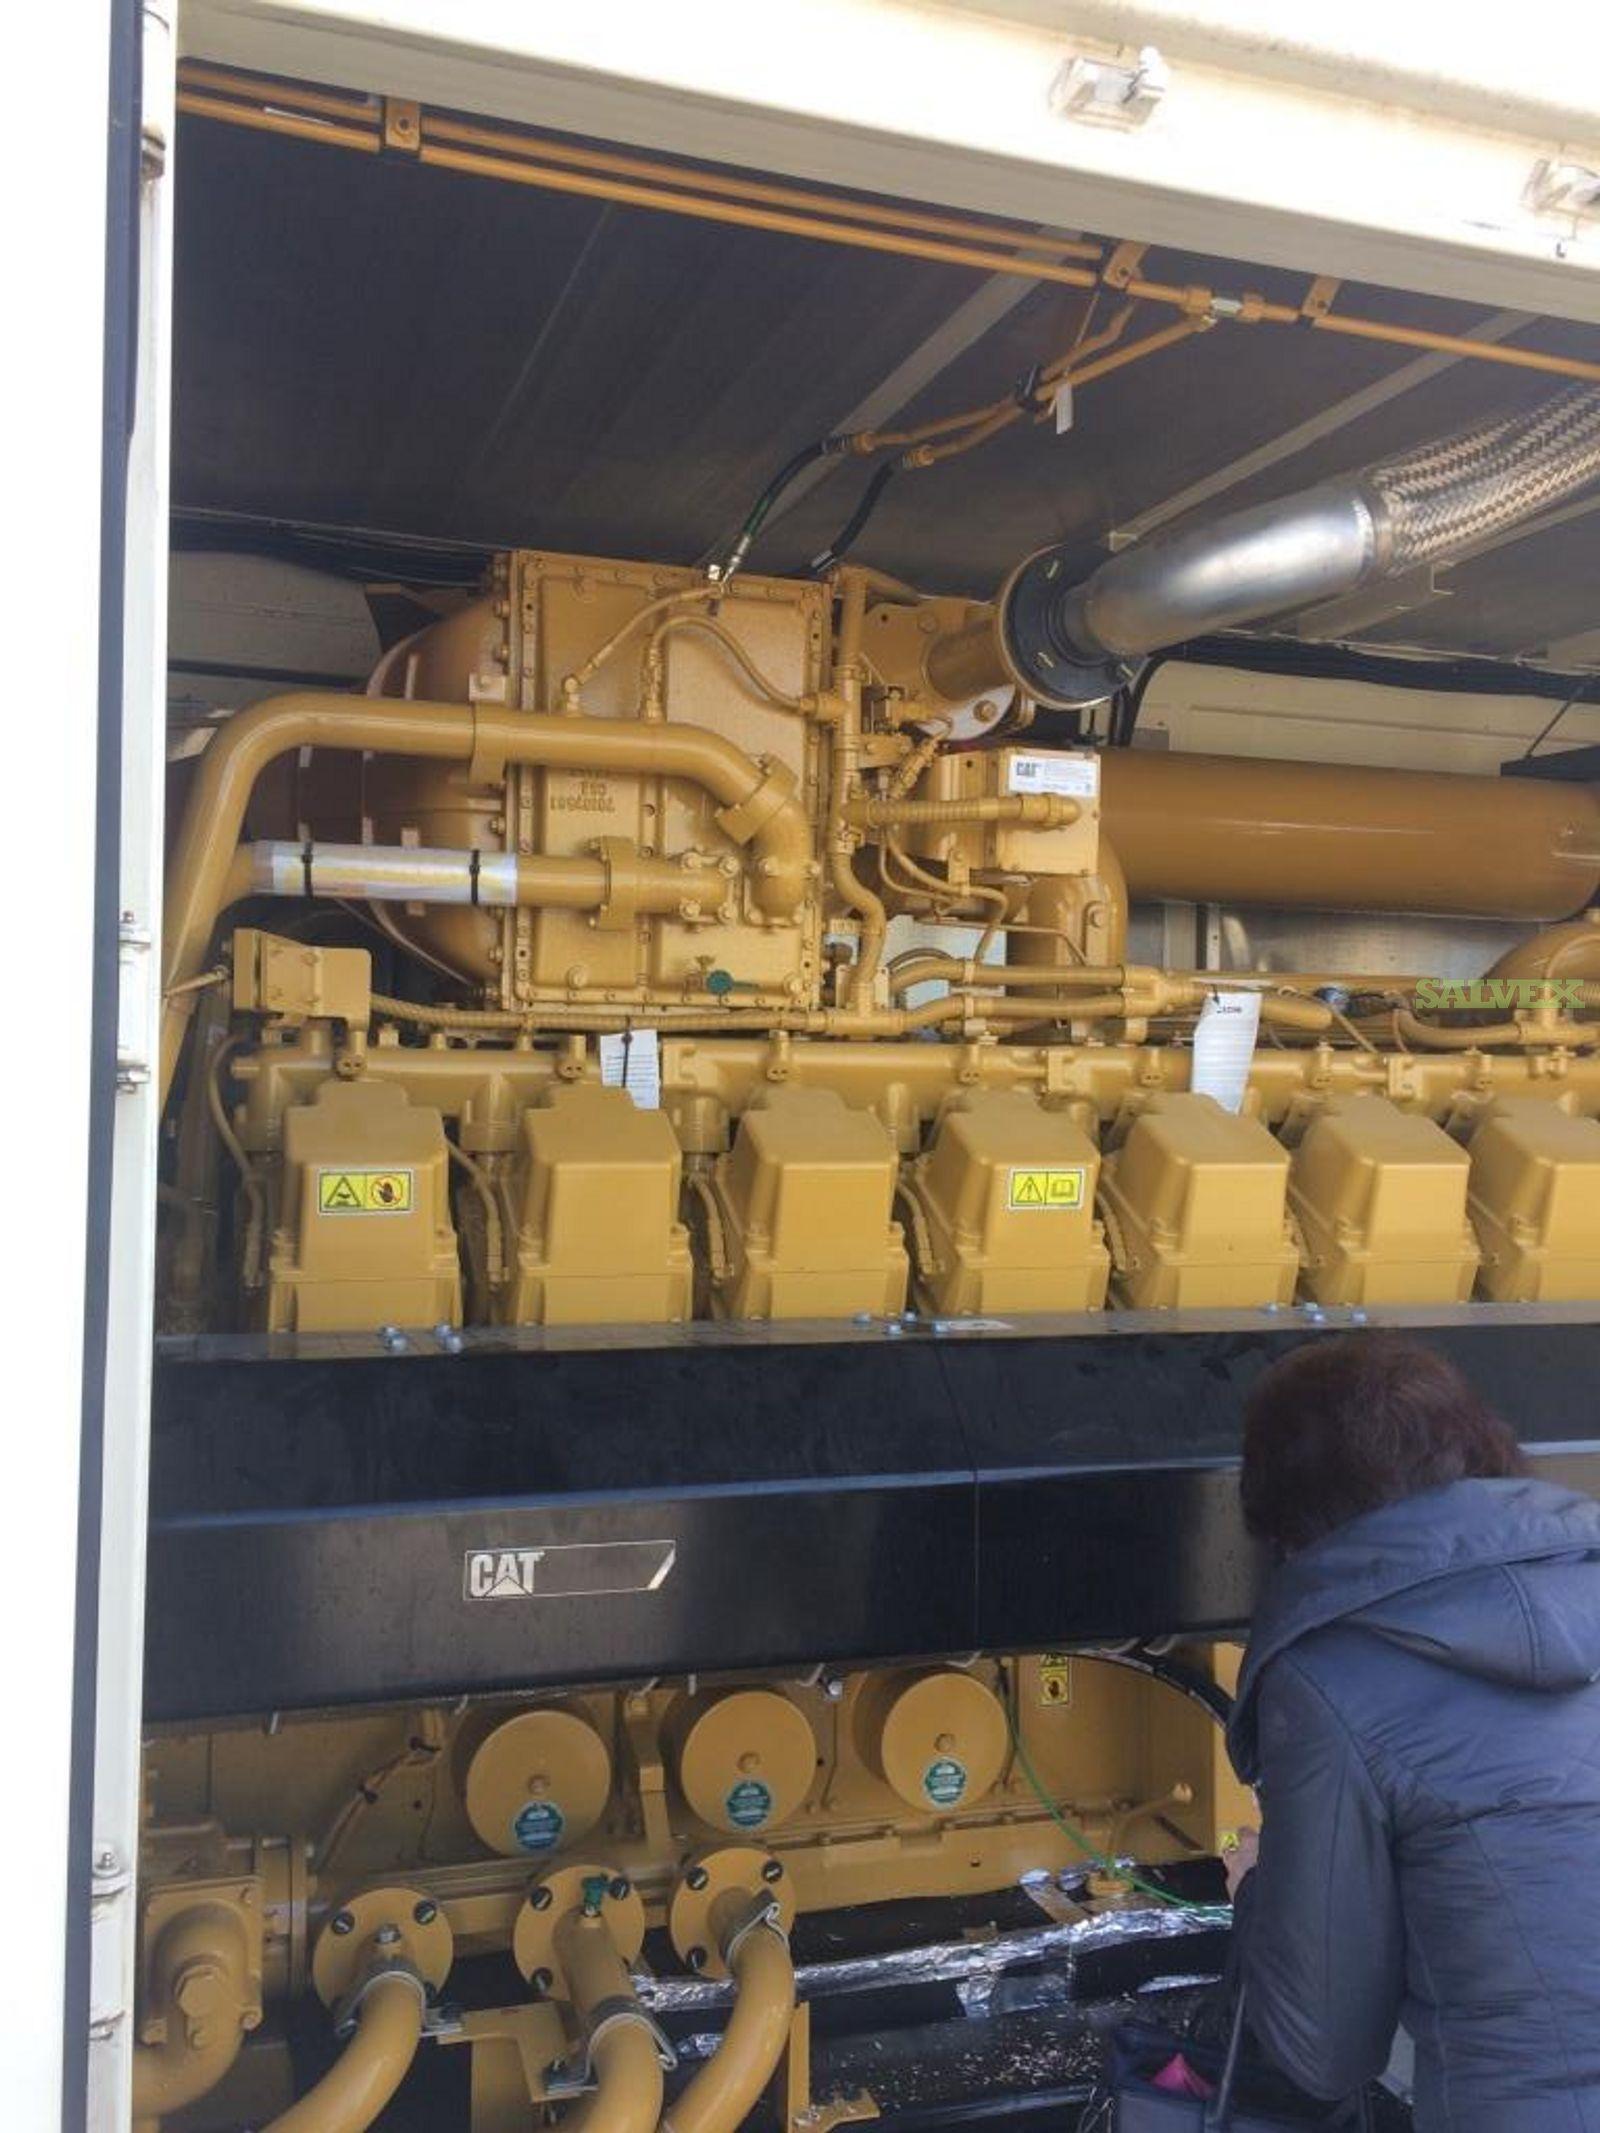 Caterpillar Mobile Generator Set Xgc1900 in Kazakhstan